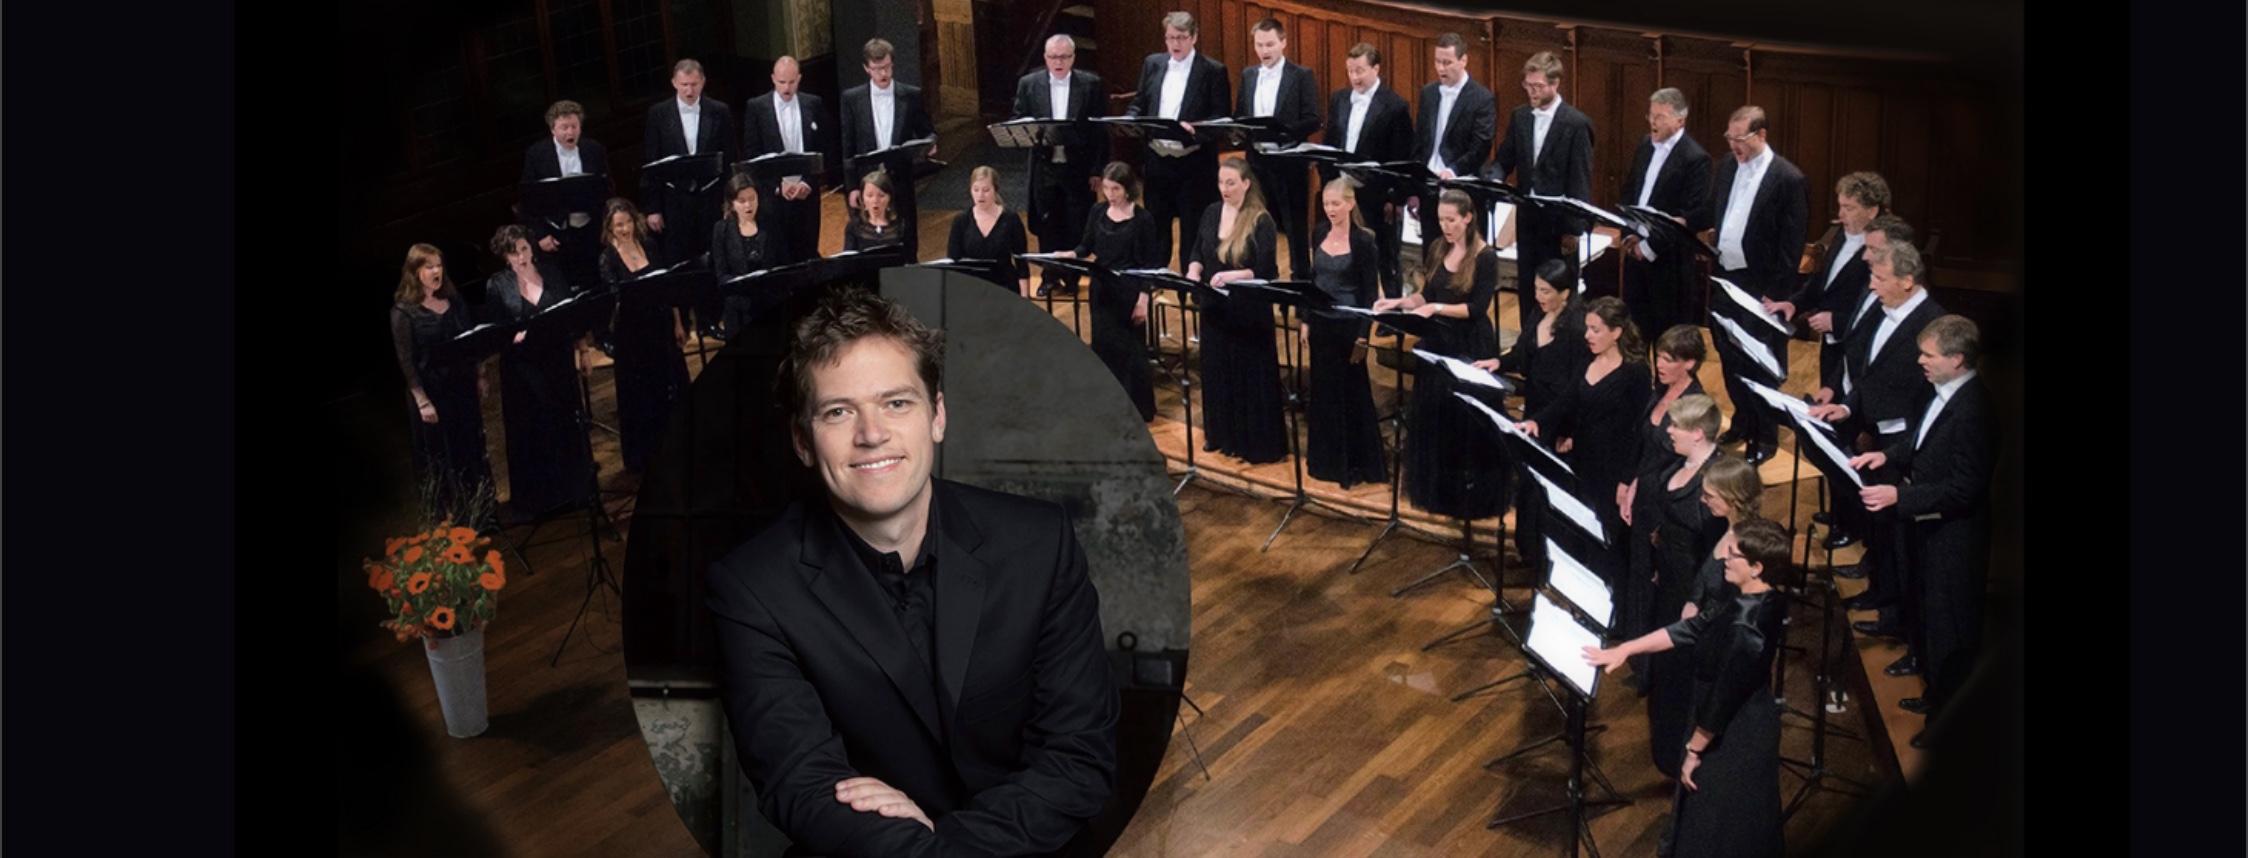 Florian Helgath, Zürcher Sing-Akademie (source: sing-akademie.ch)